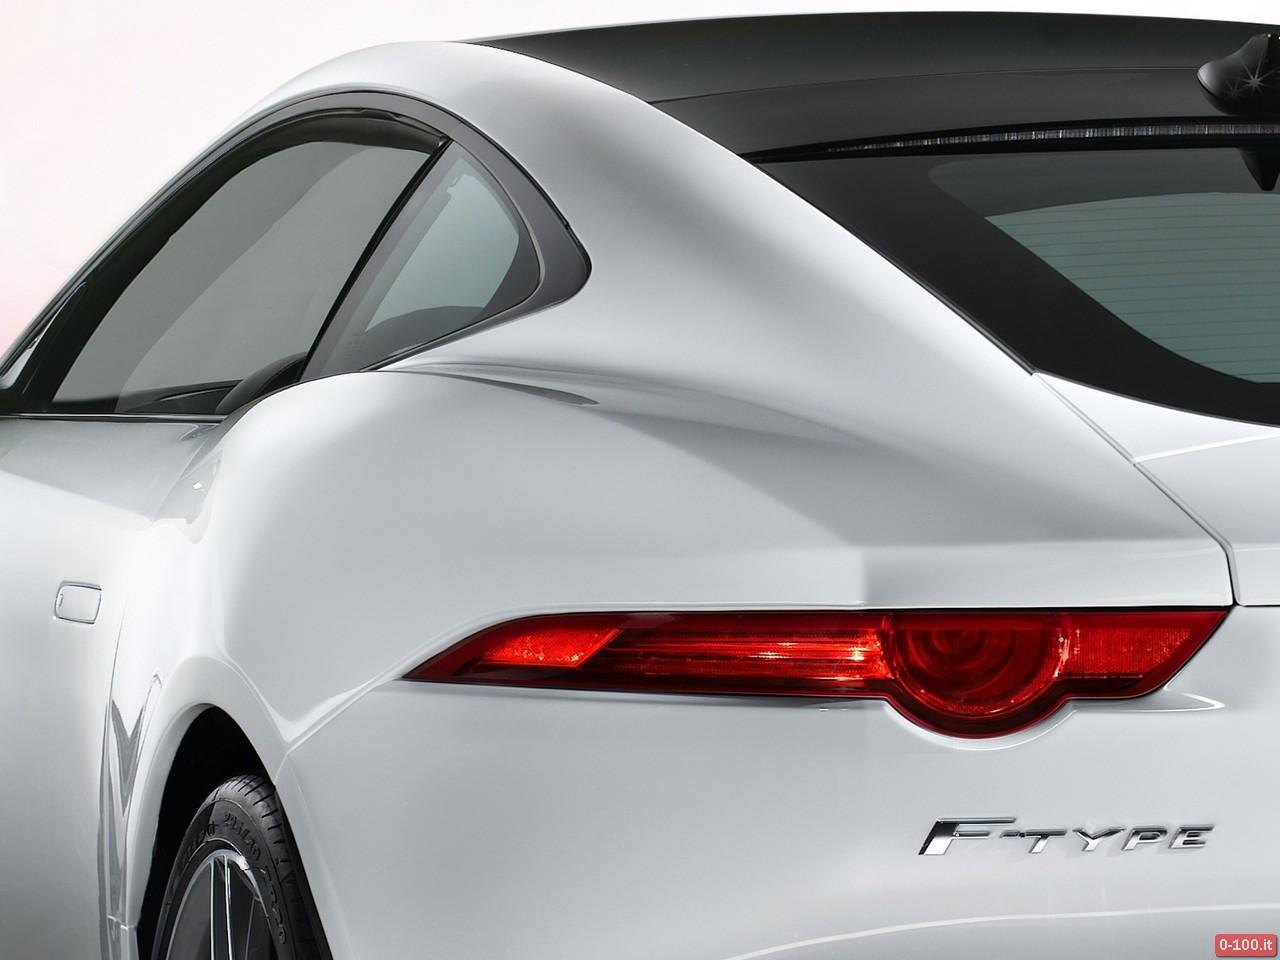 jaguar-f-type-r-coupe_price-prezzo-0-100_11